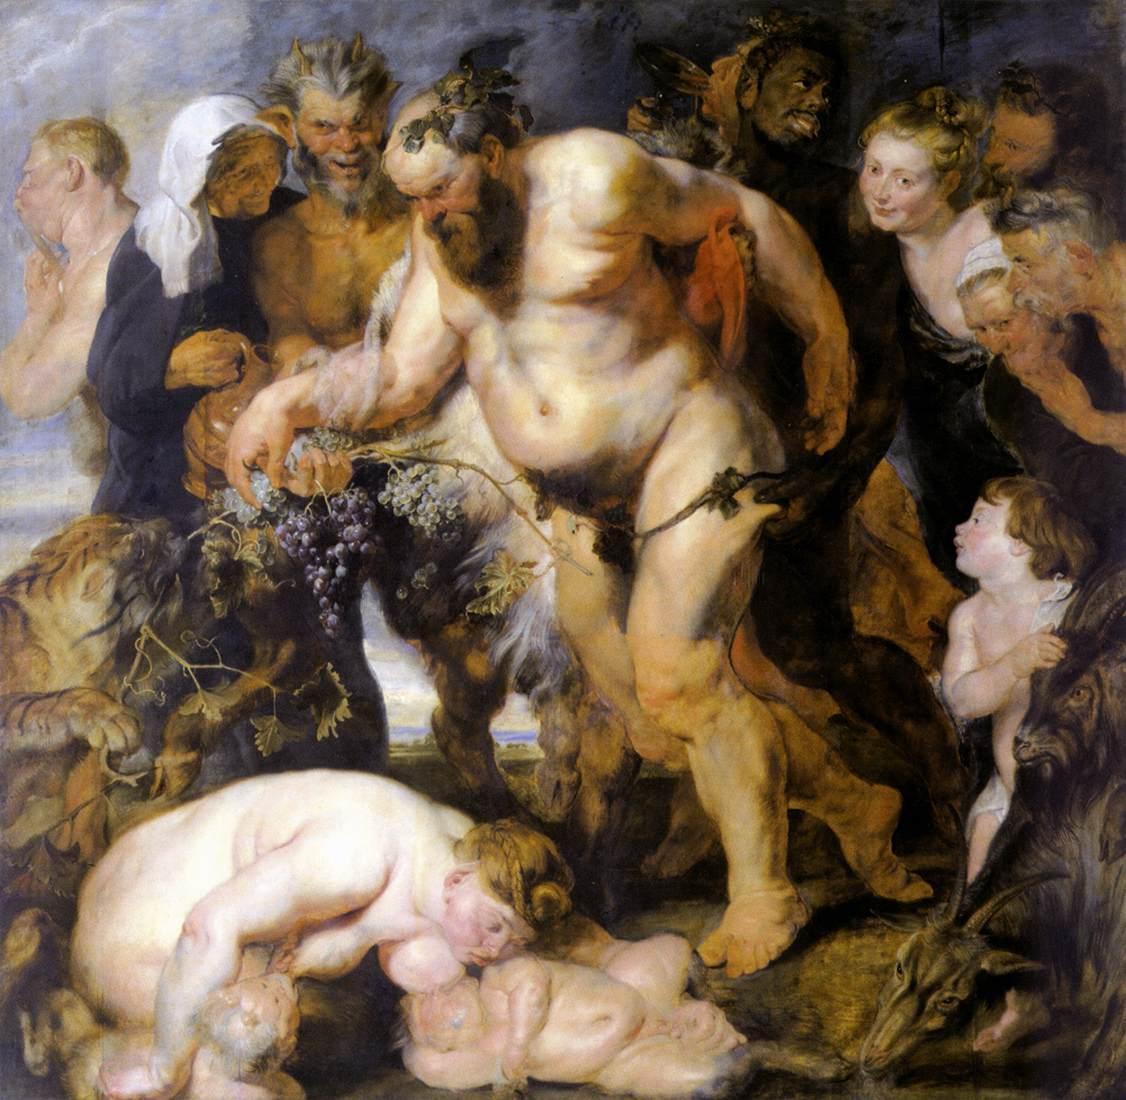 02 Silène ivre, Peter Paul Rubens, 1616 Munich Alta Pinacothek